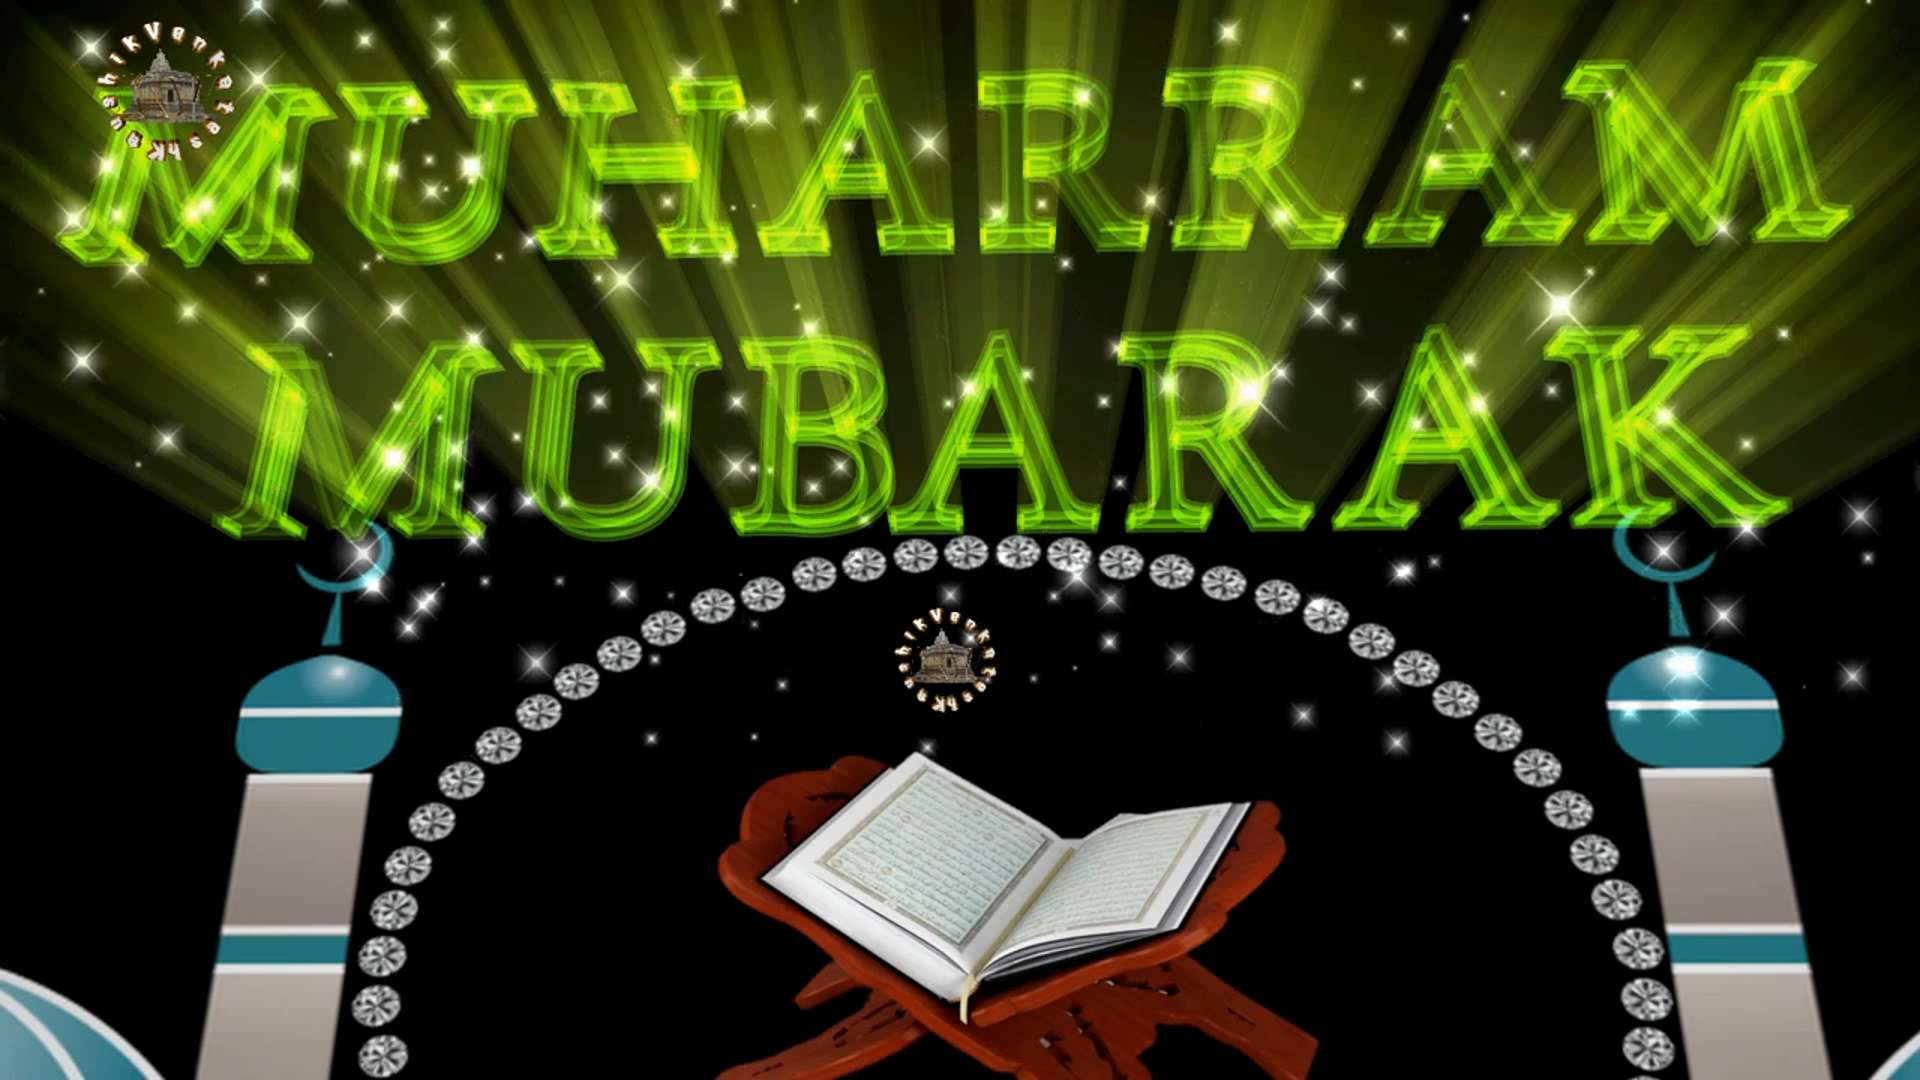 Image of Happy Muharram 2021 Wishes Video